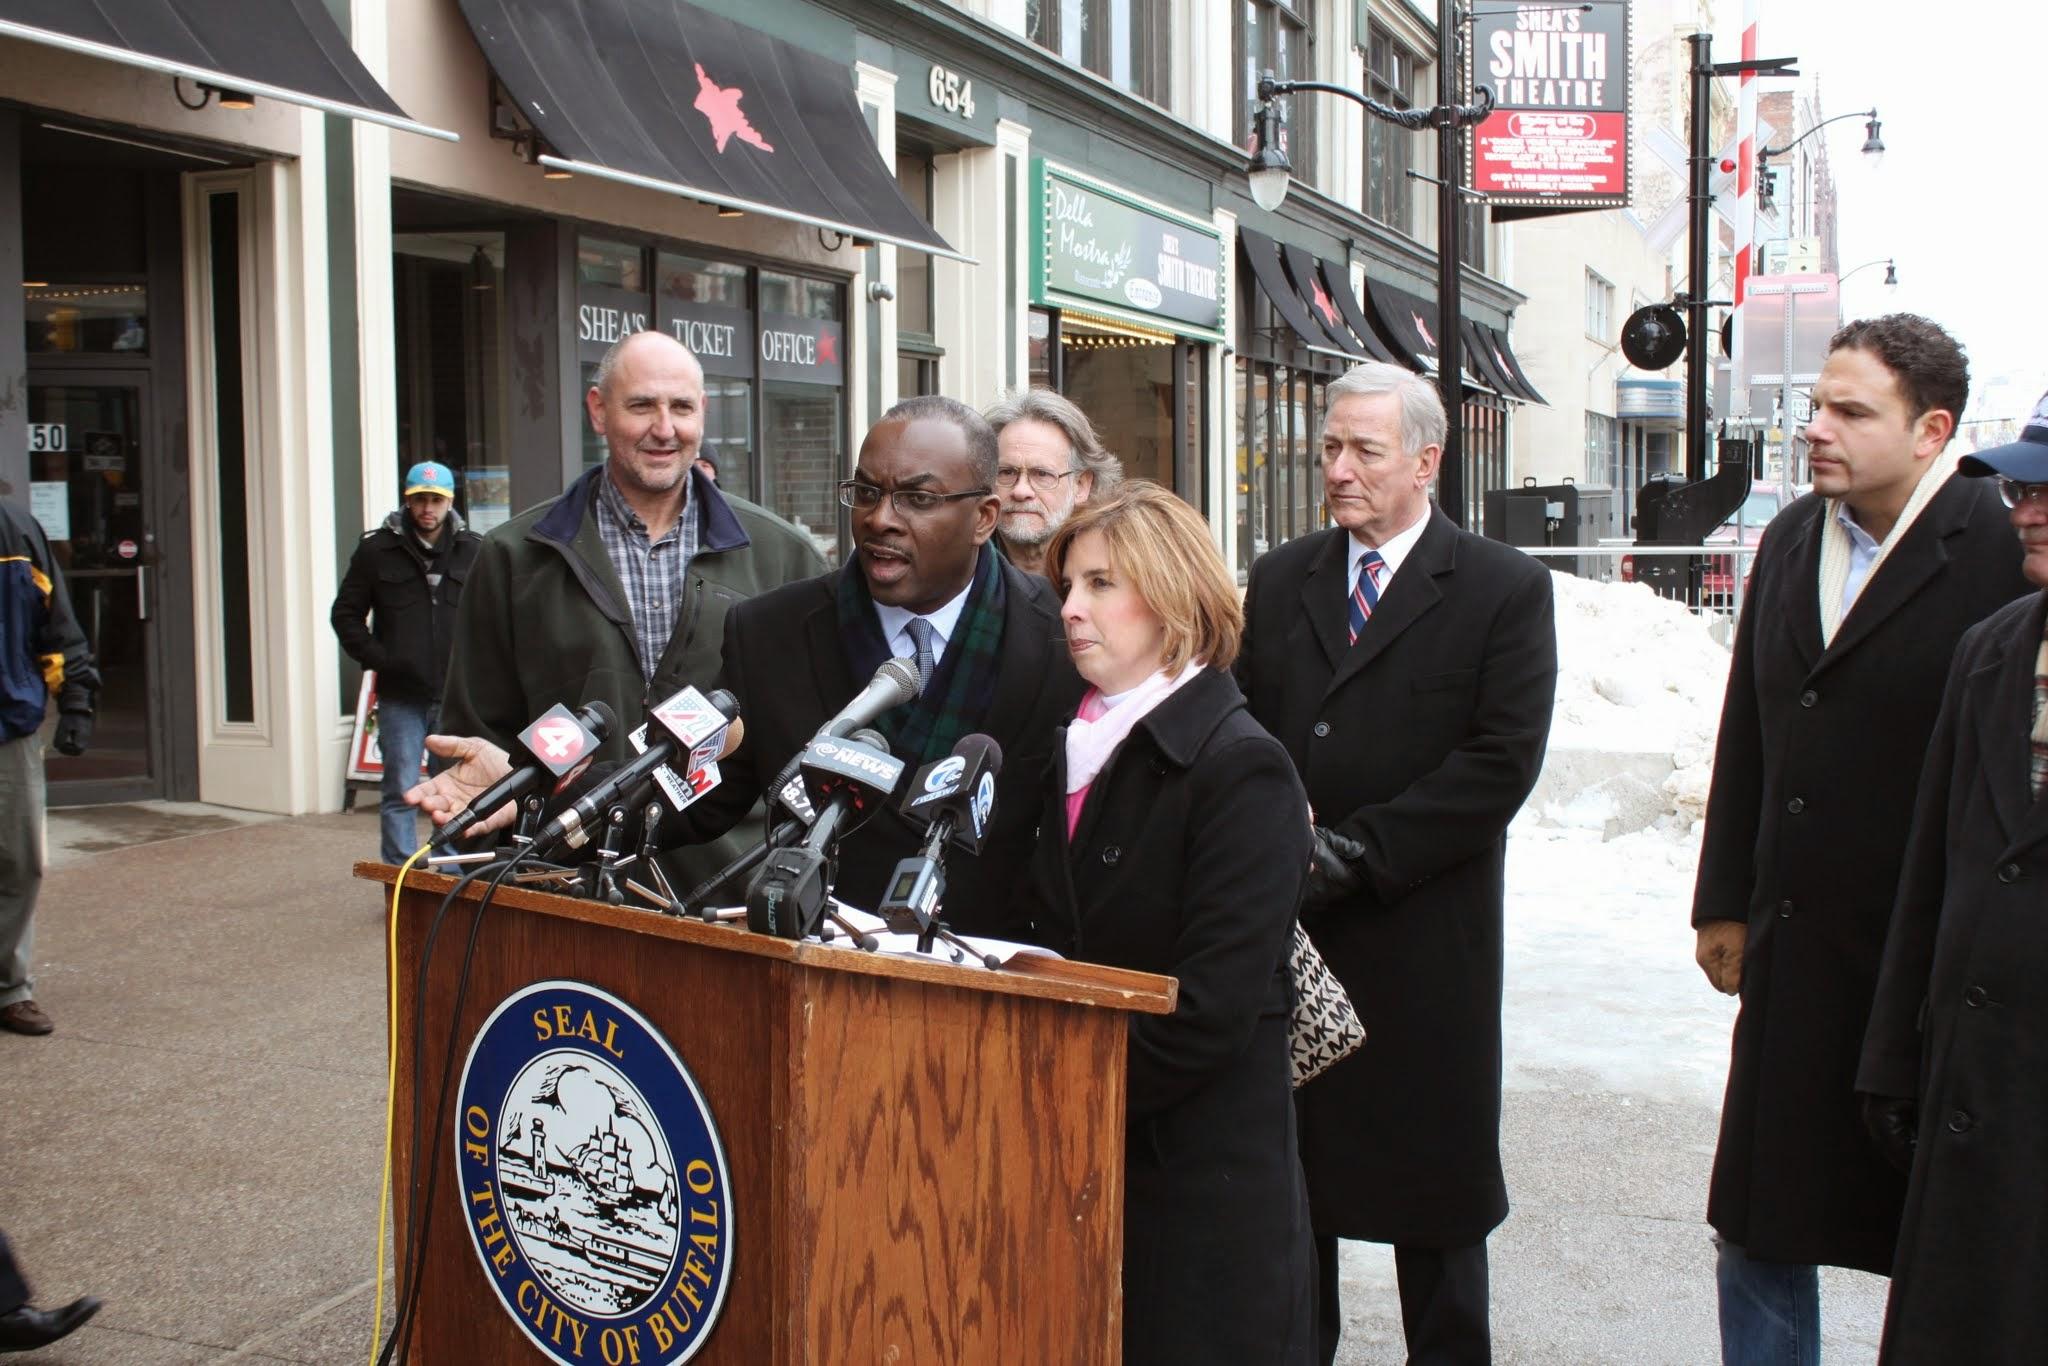 Photo: City of Buffalo Mayor Byron Brown with Kimberley Minkel